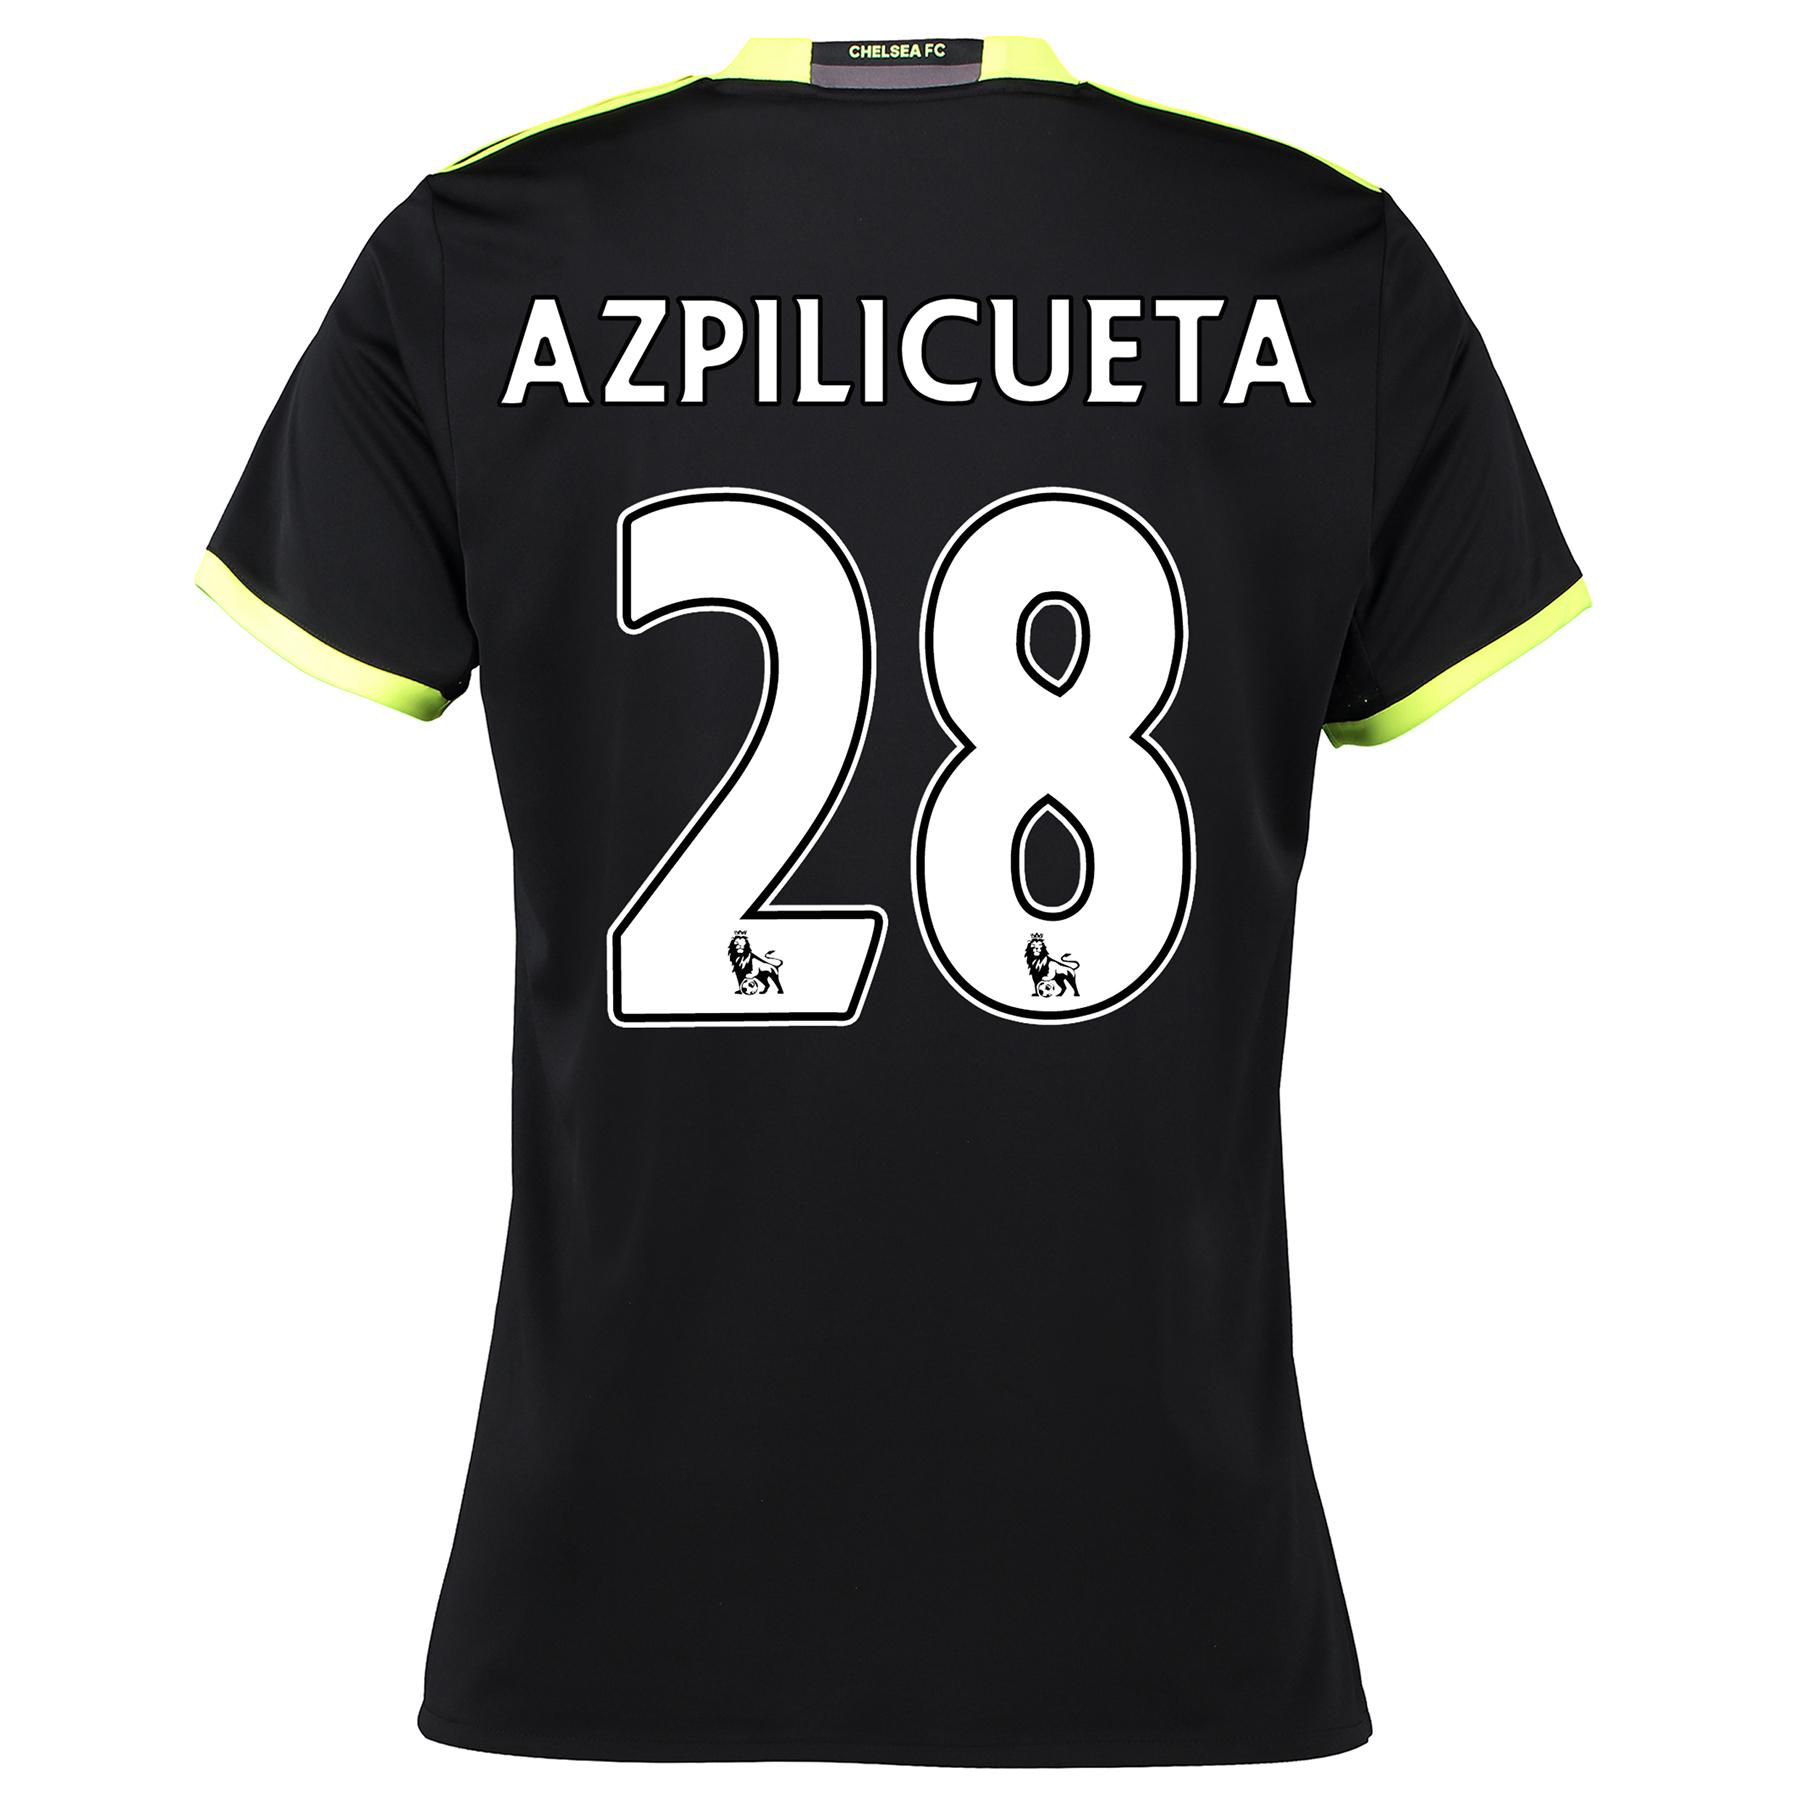 Chelsea Away Shirt 16-17 - Womens with Azpilicueta 28 printing